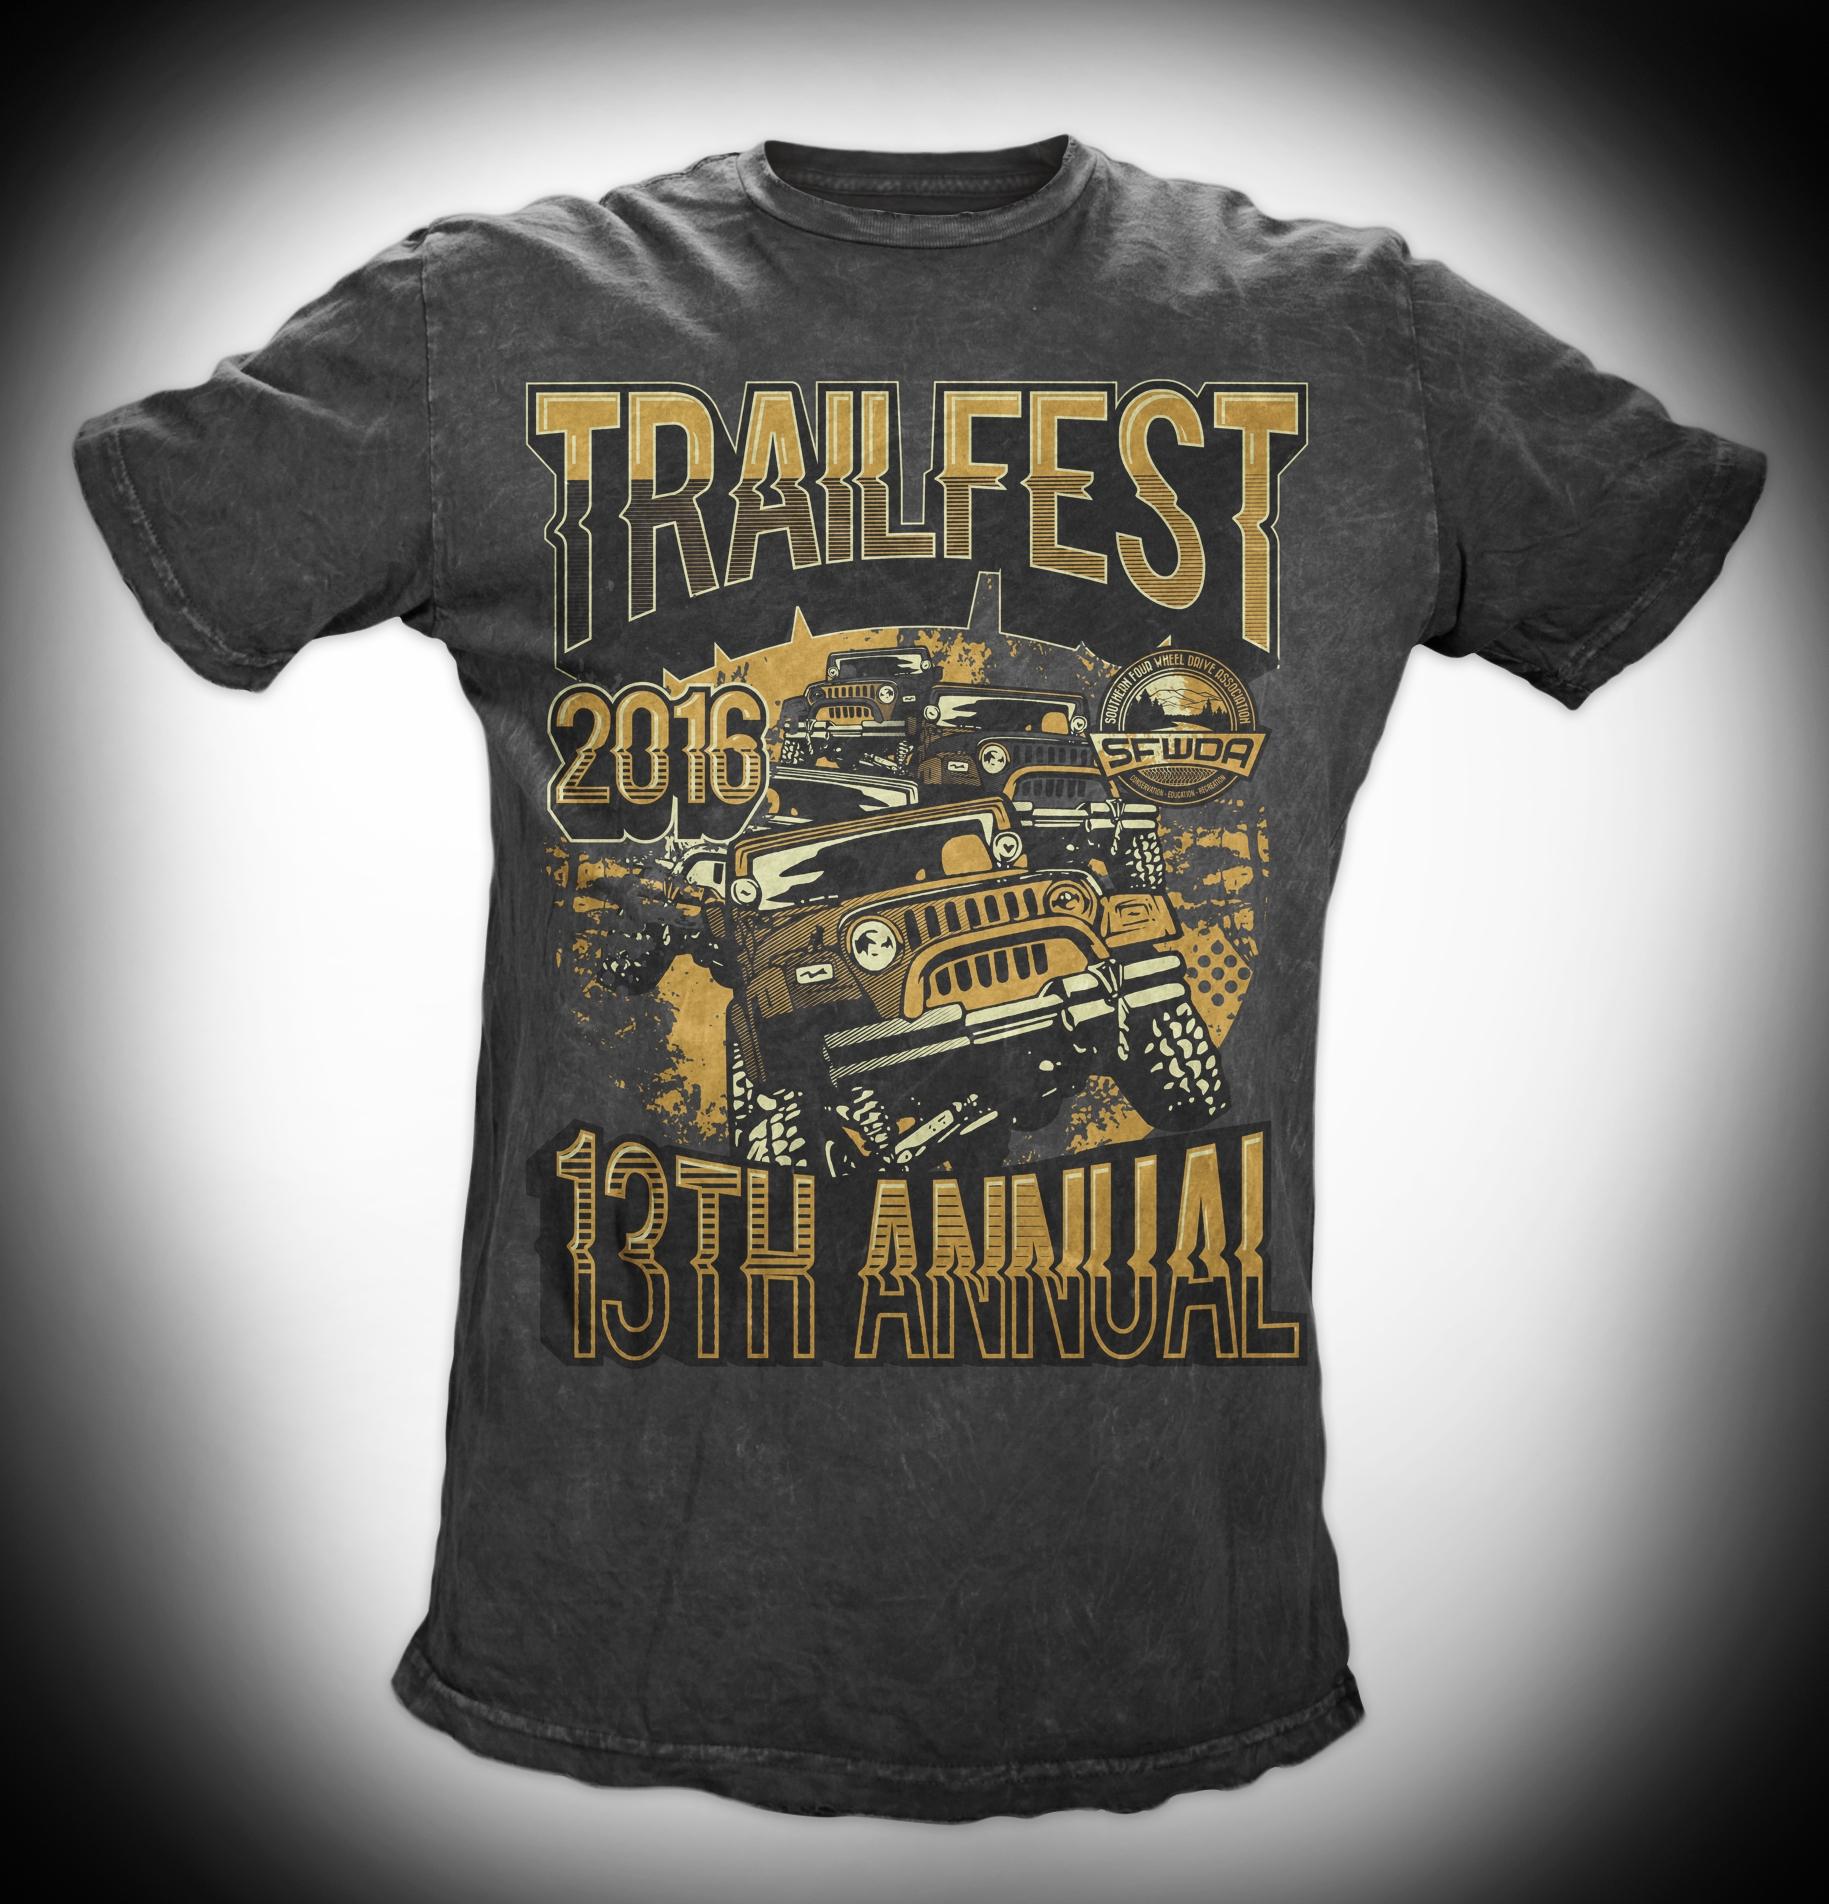 All new Trailfest 2016 Shirt Design